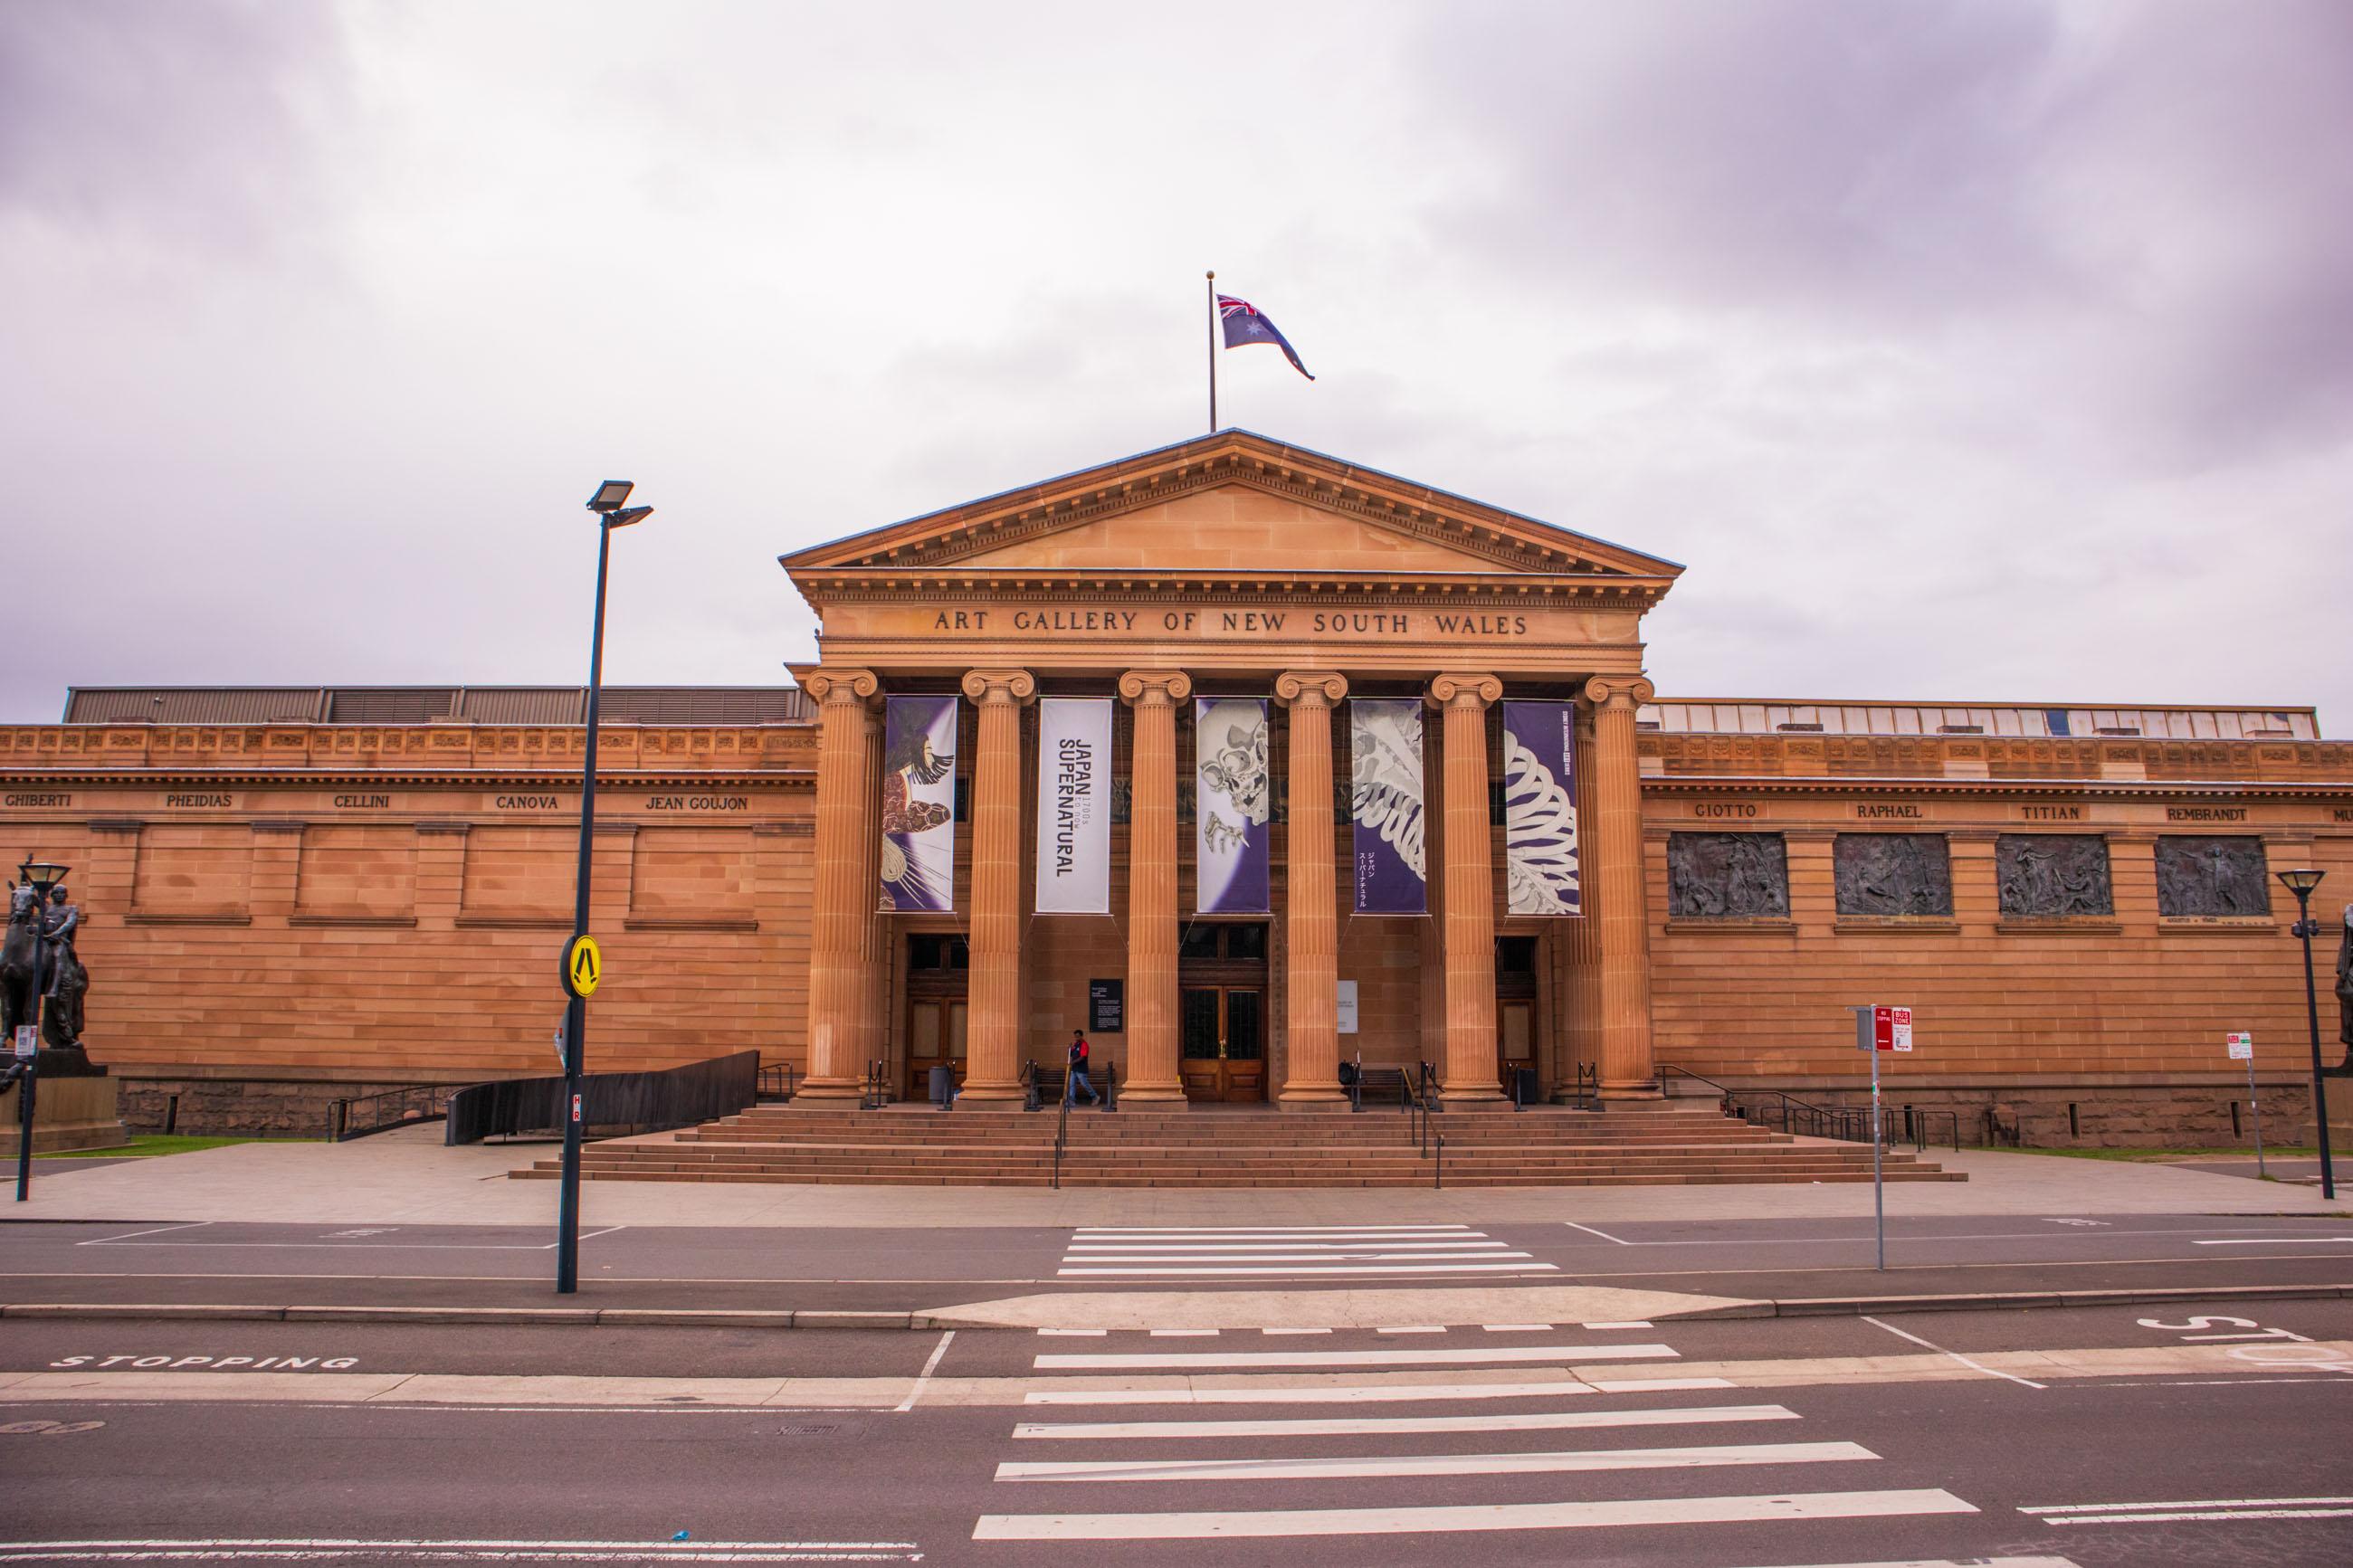 https://bubo.sk/uploads/galleries/5028/veron_hulikova_australia_sydney_galeriansw.jpg